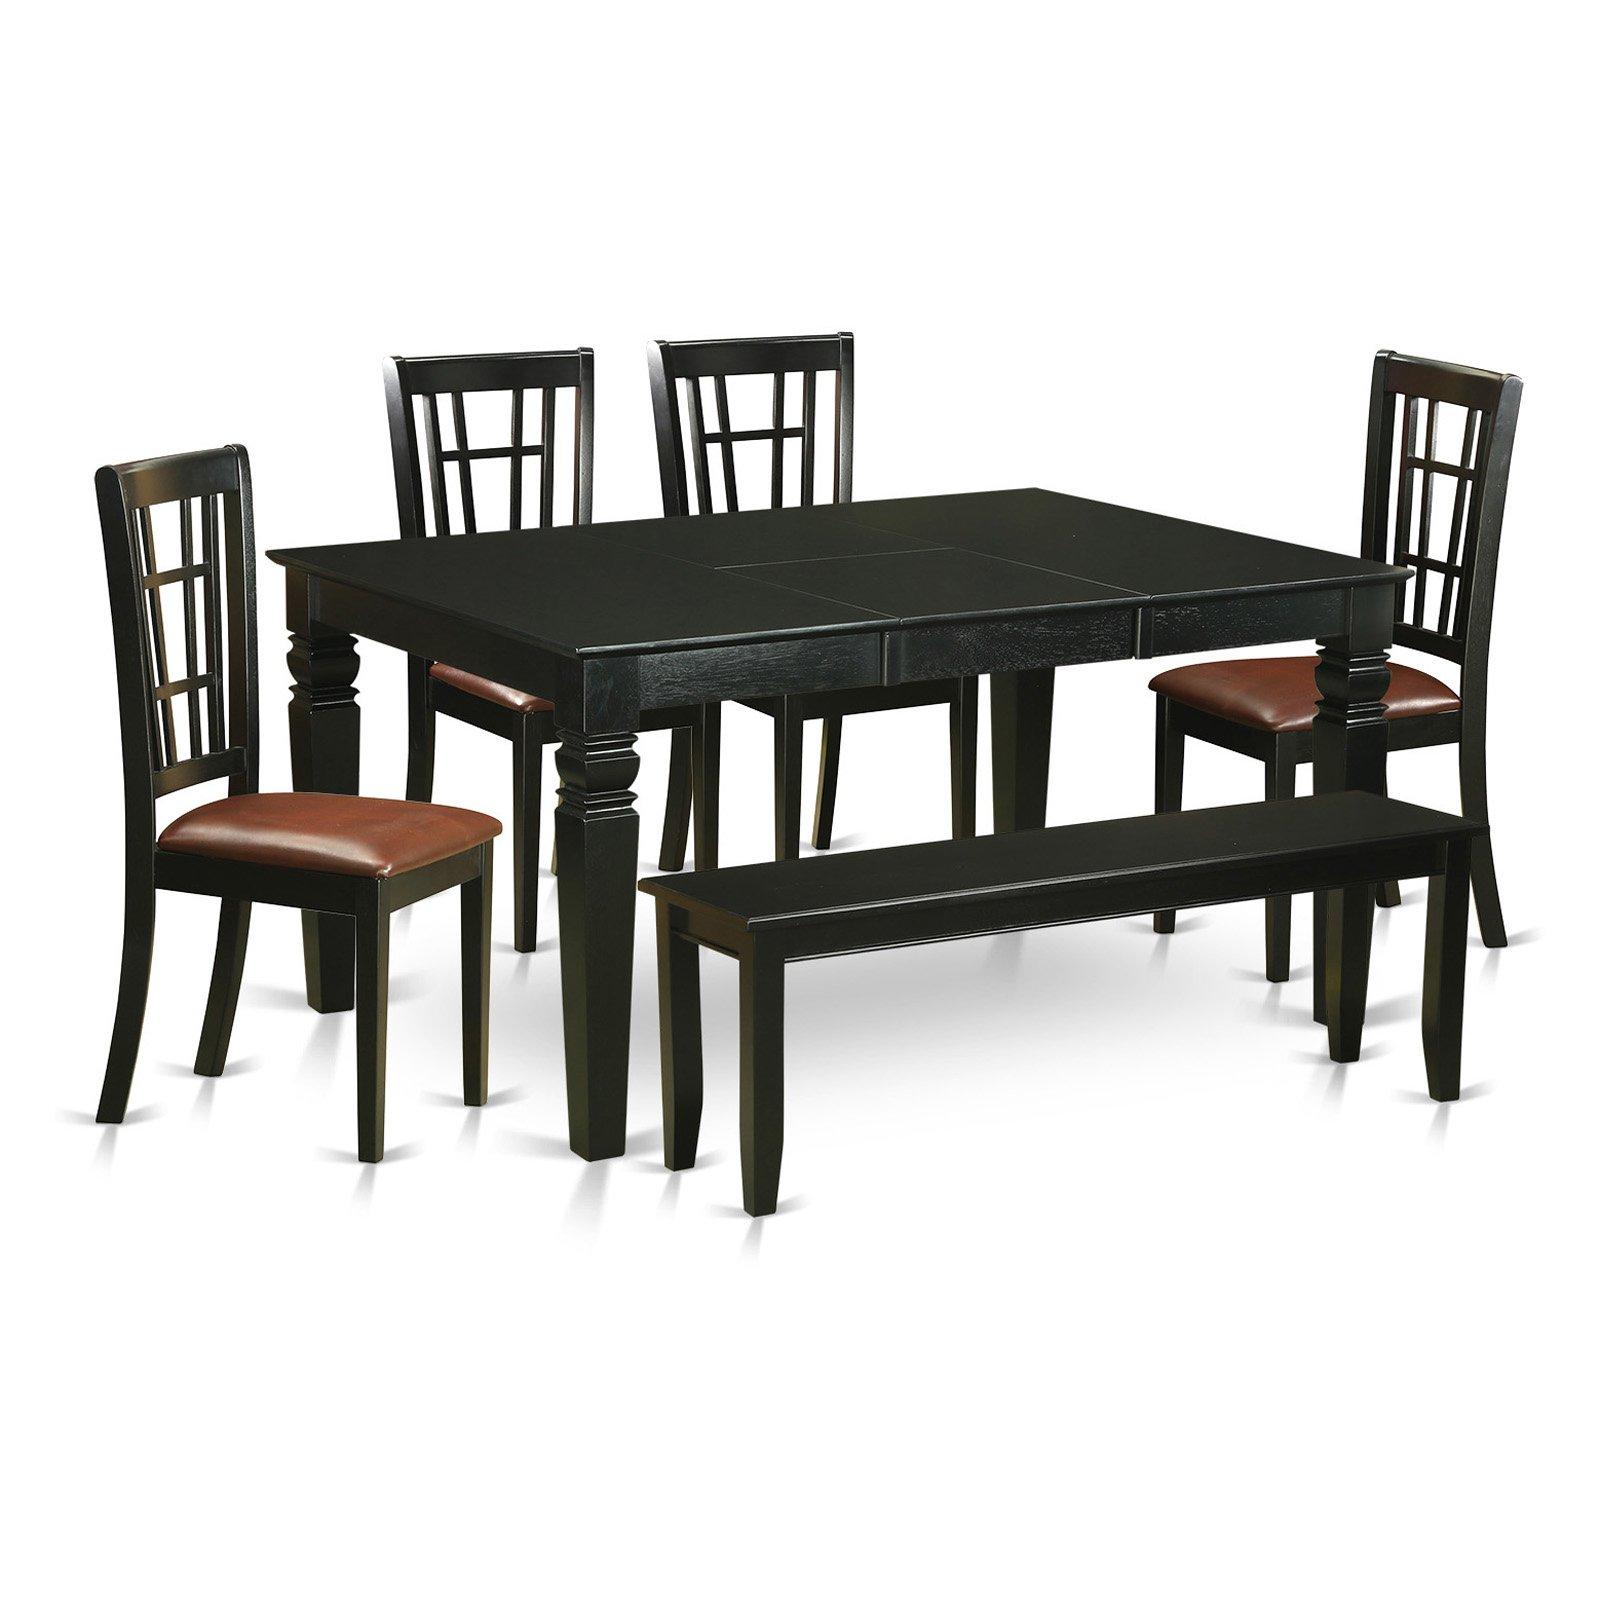 East West Furniture Weston 6 Piece Windowpane Dining Table Set